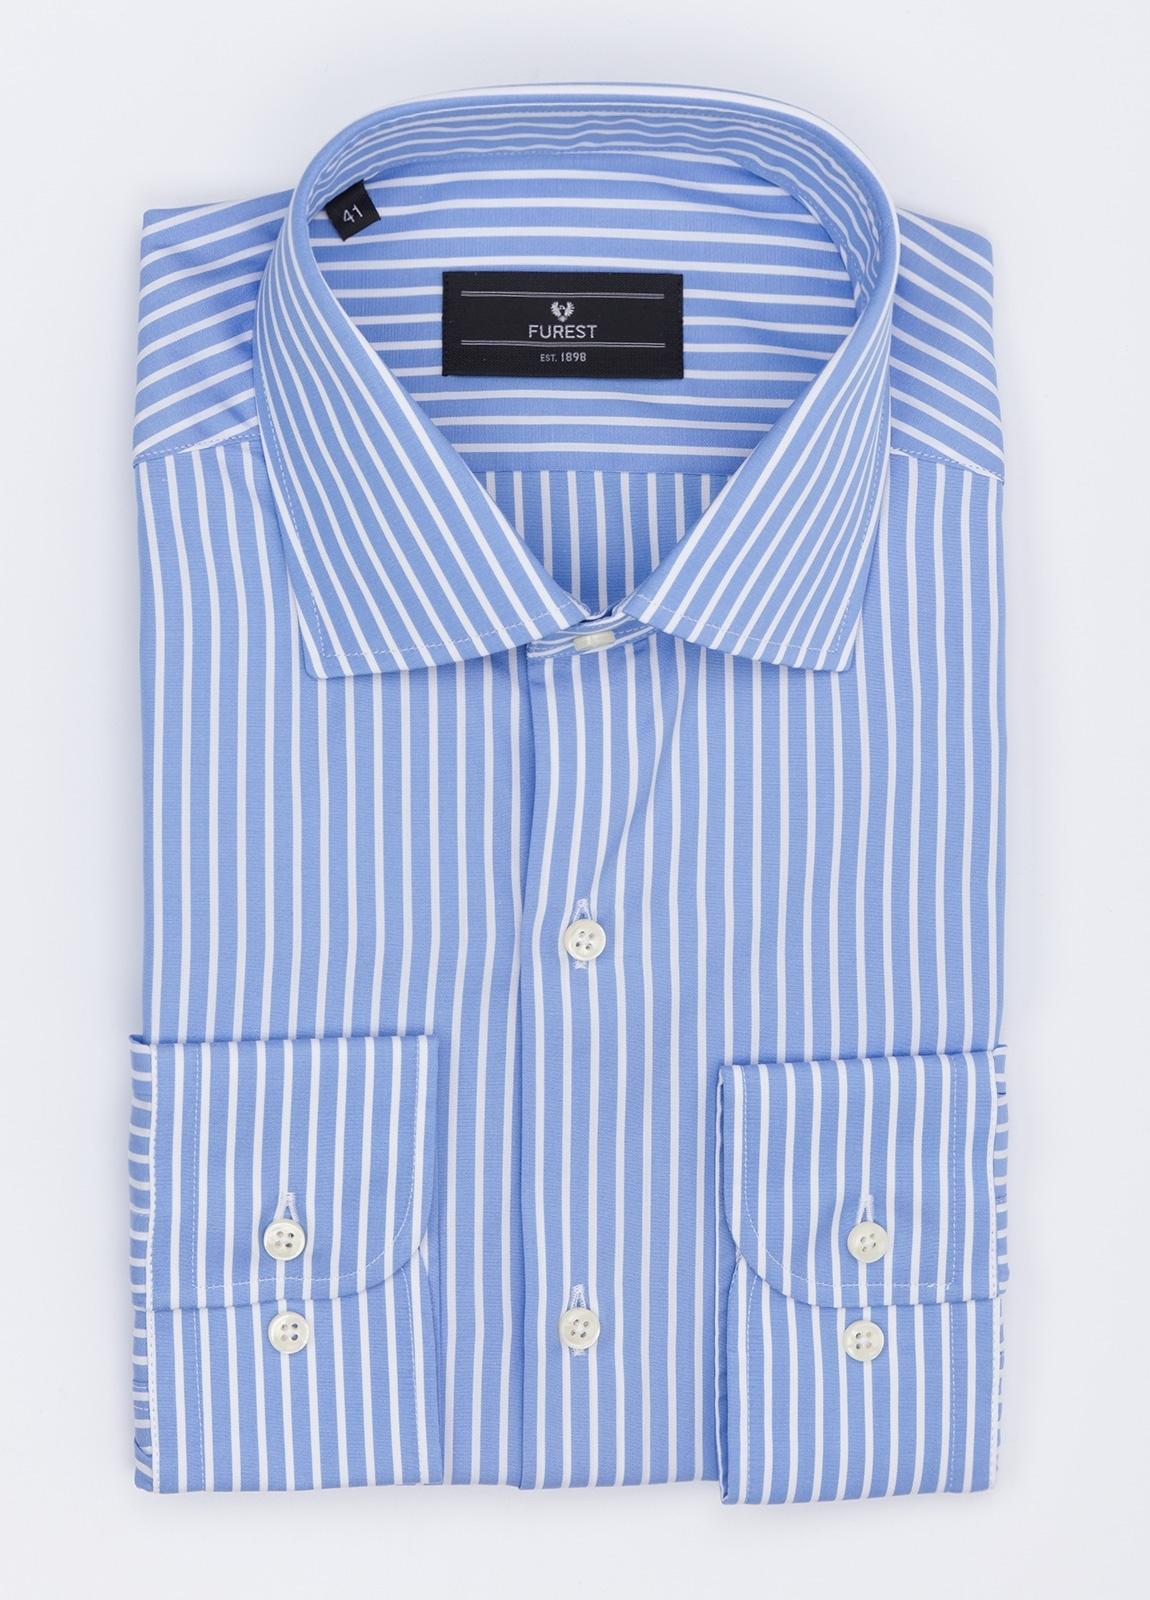 Camisa Formal Wear REGULAR FIT cuello roma modelo TAILORED NAPOLI, raya clásica color azul, 100% Algodón.